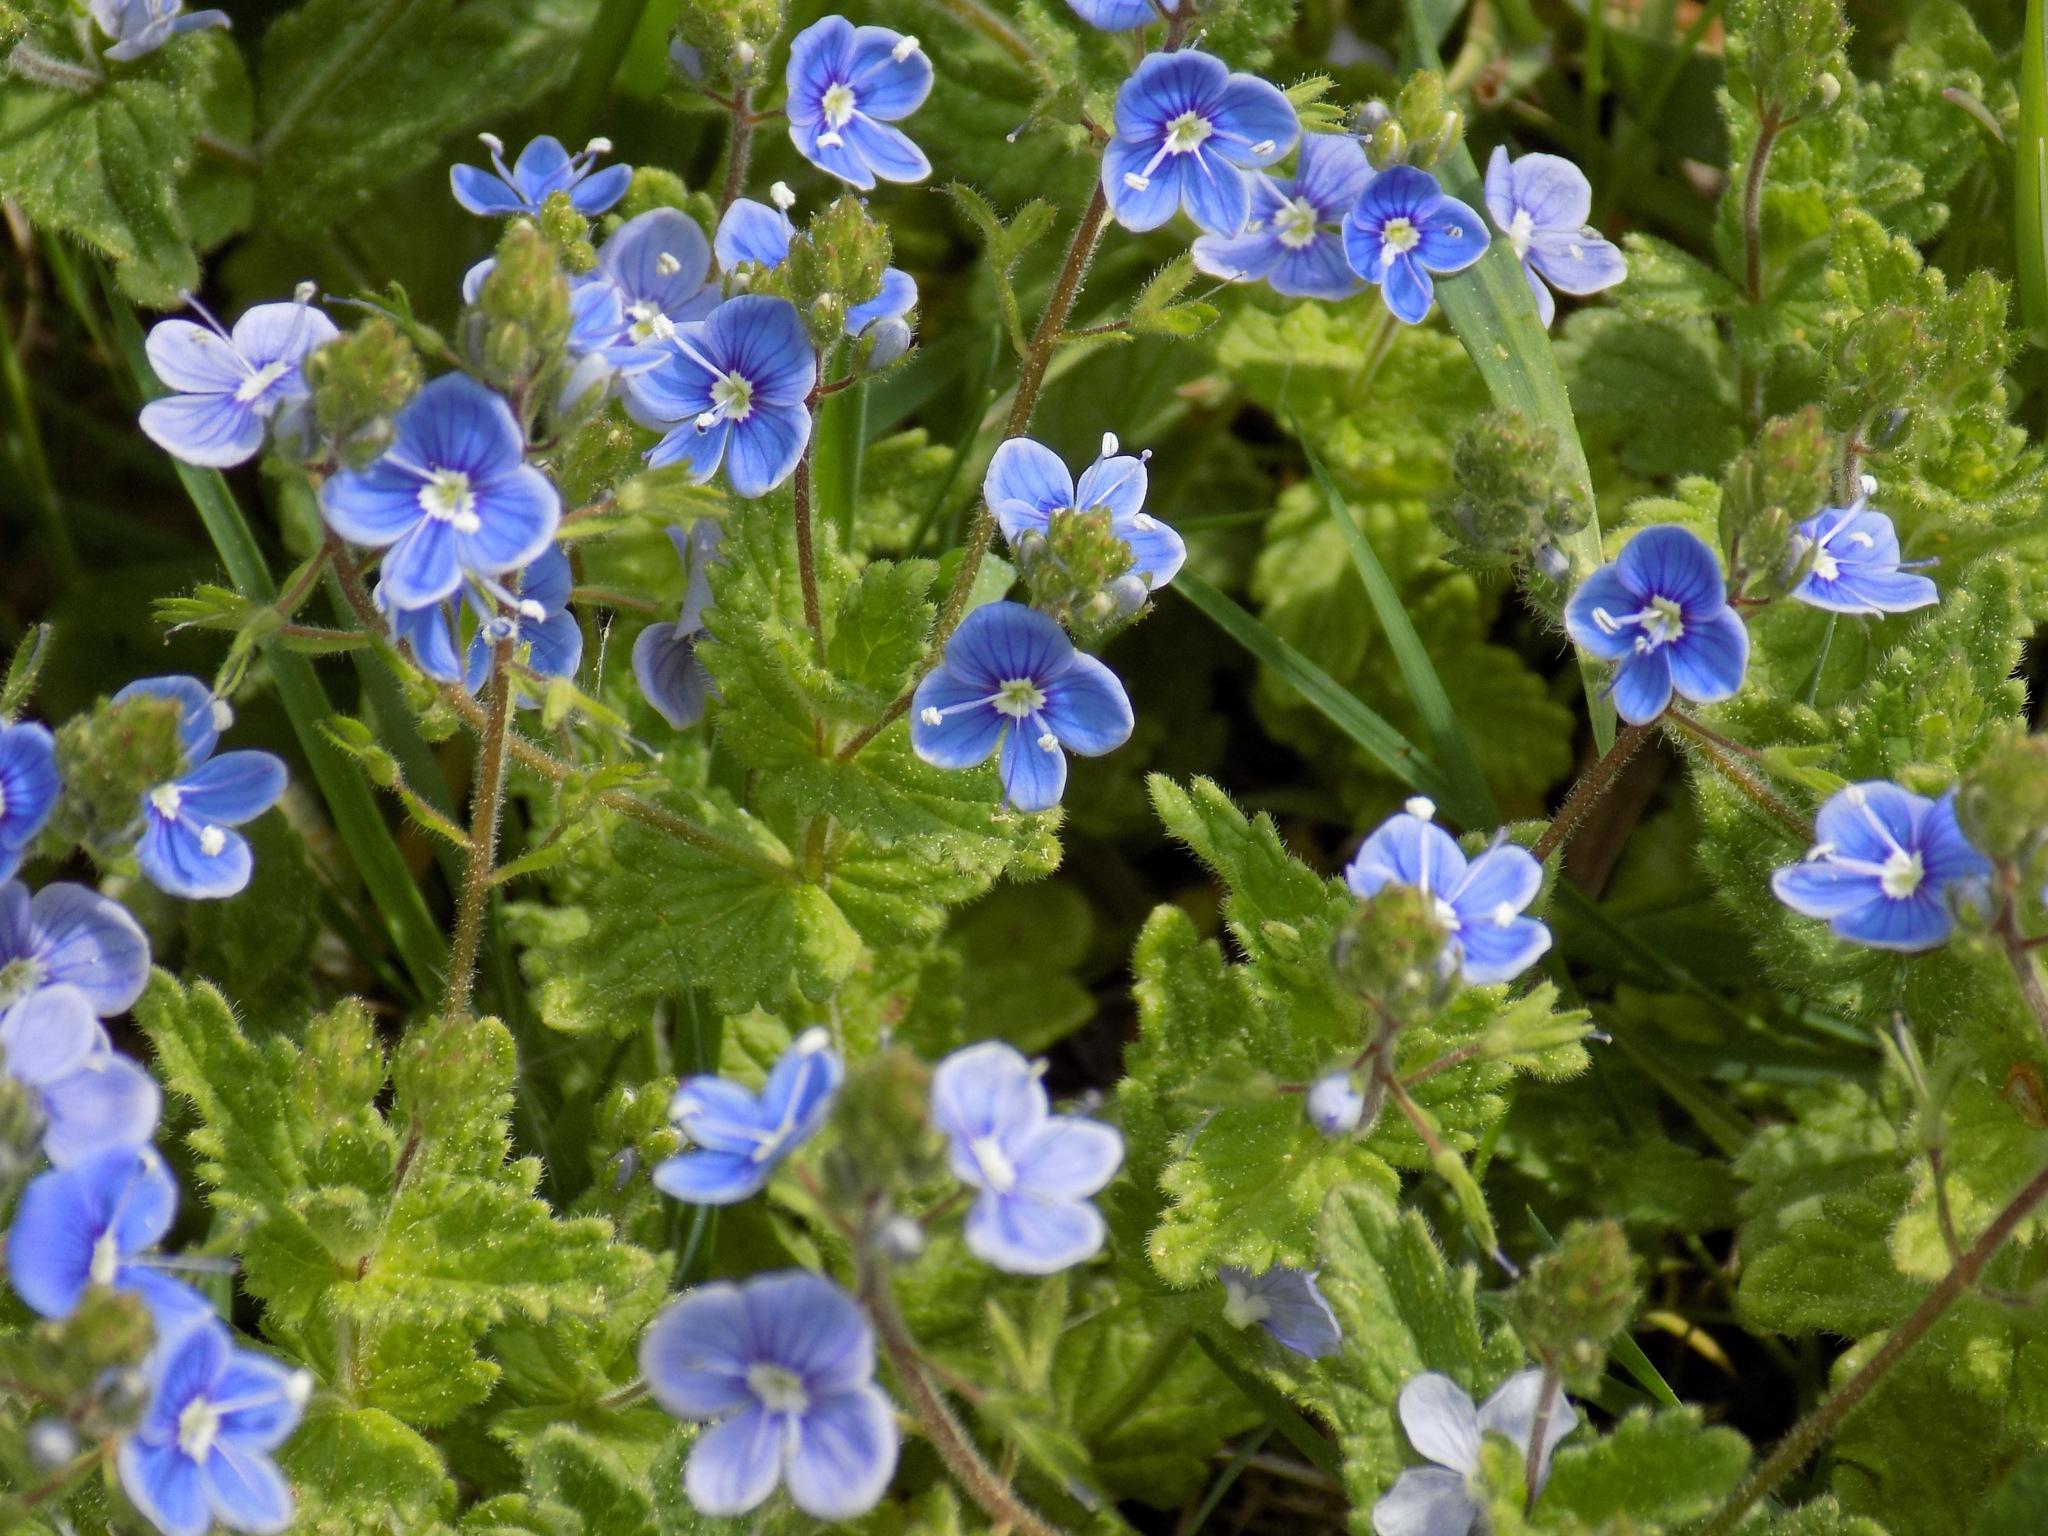 Wild flowers by uzkuraitiene62